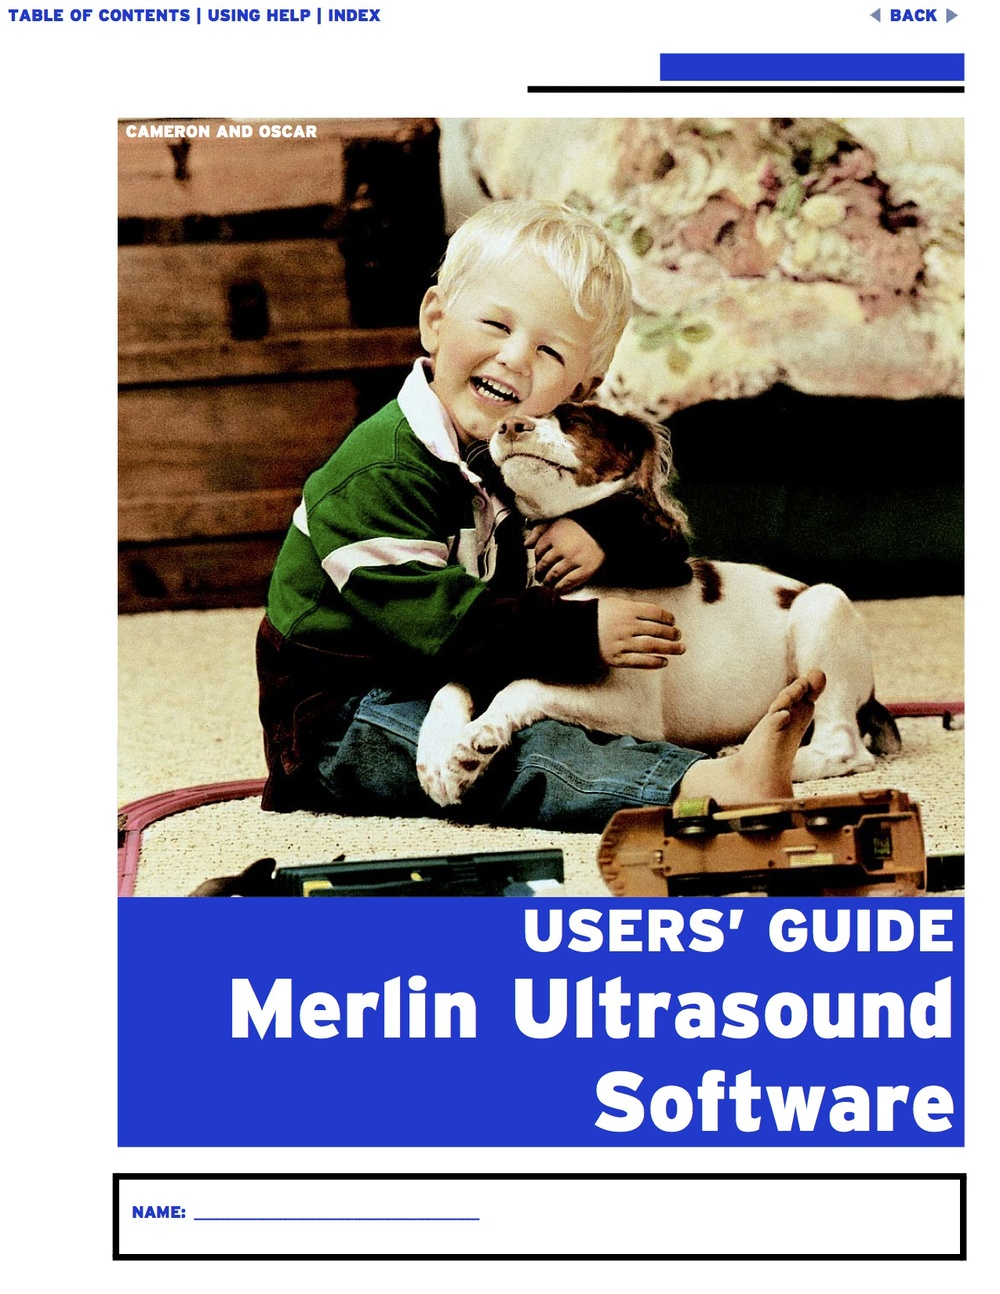 Telemedicine_Users_Guide1.jpg